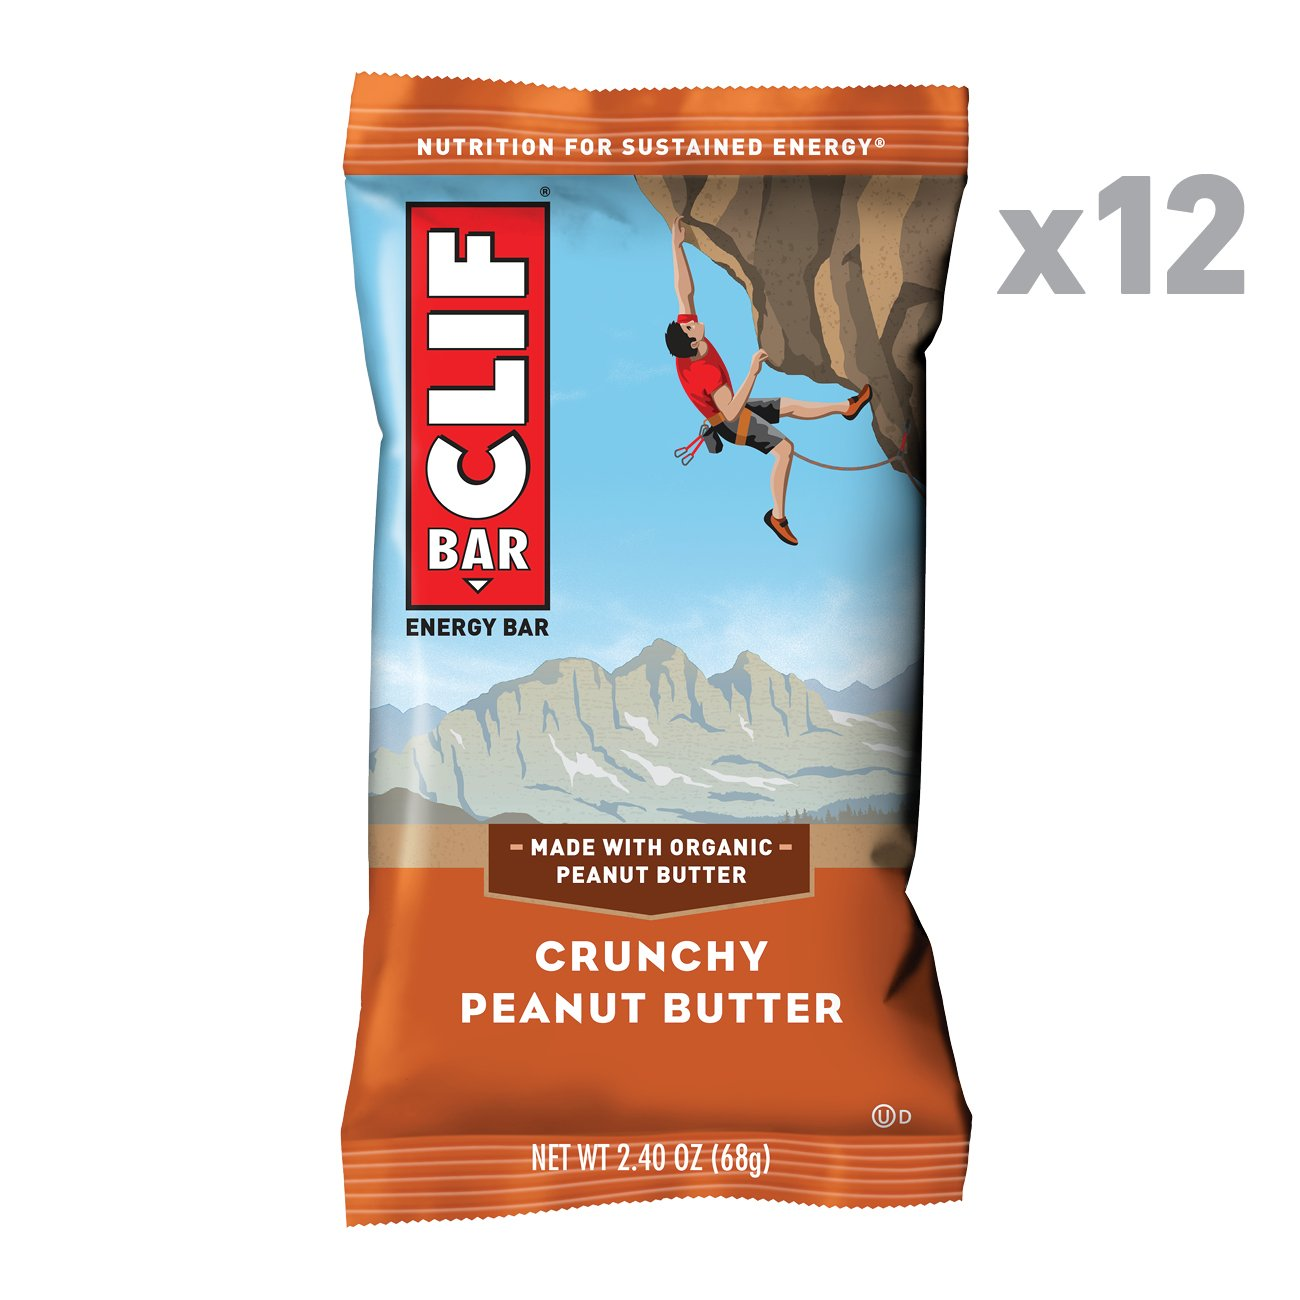 CLIF BAR - Energy Bar - Crunchy Peanut Butter - (2.4 Ounce Protein Bar, 12 Count) by Clif Bar